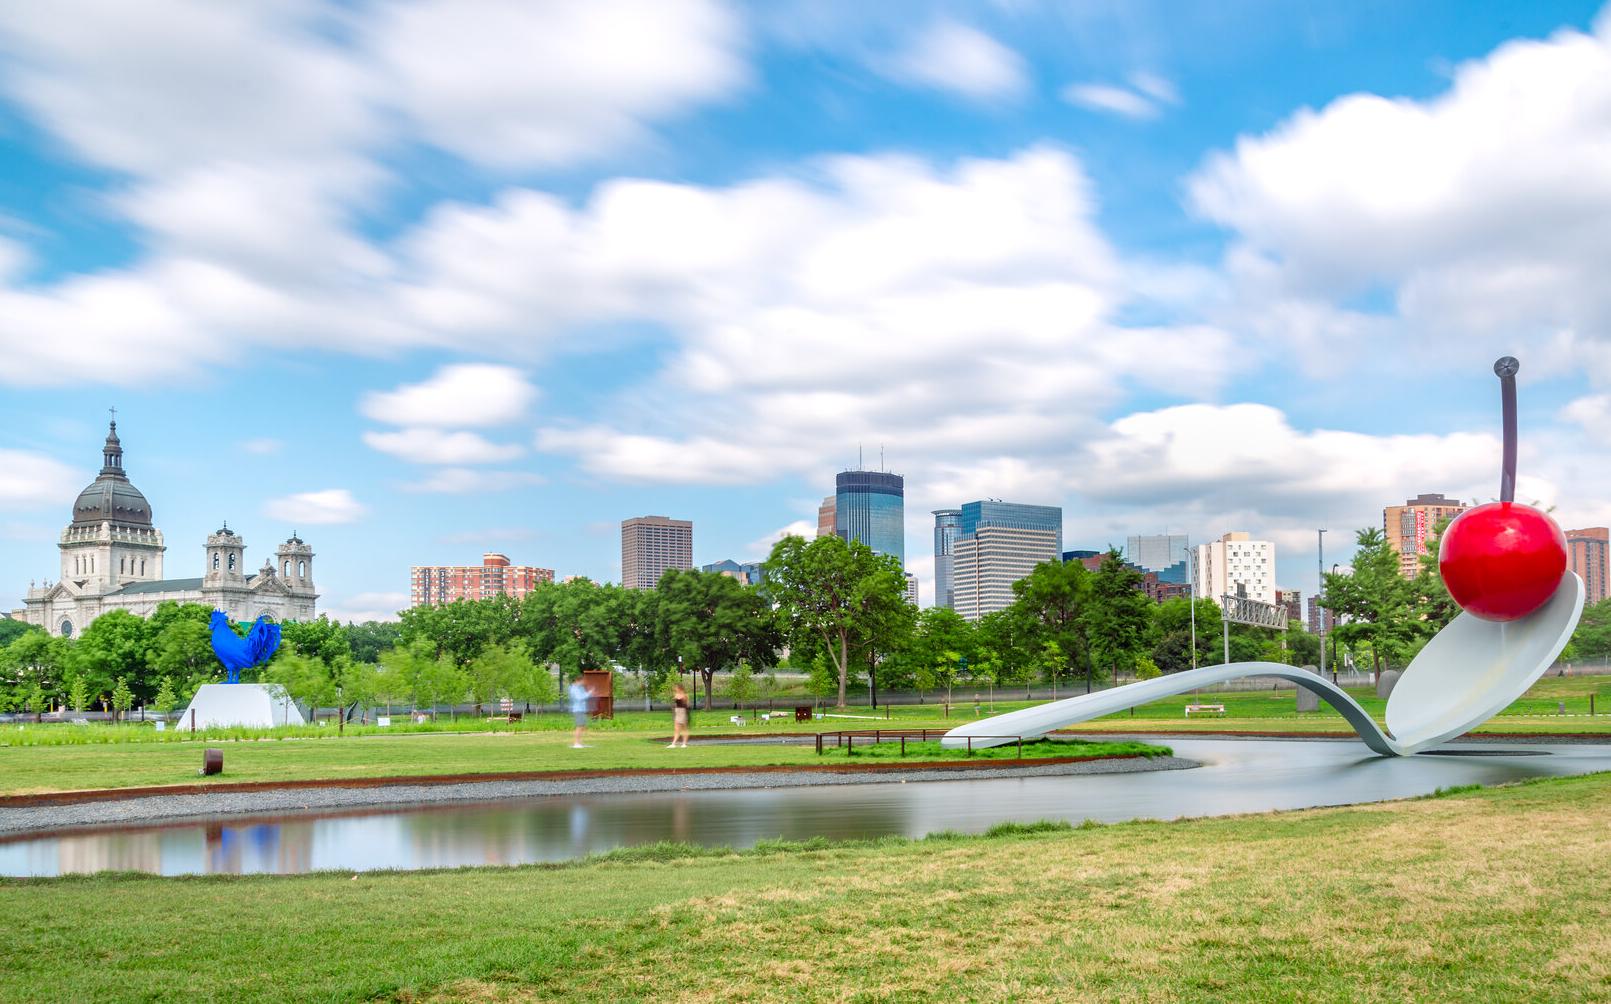 Spoonbridge and Cherry, Walker Art Center, Minneapolis. Photo by Zachary Sumners, Flickr.